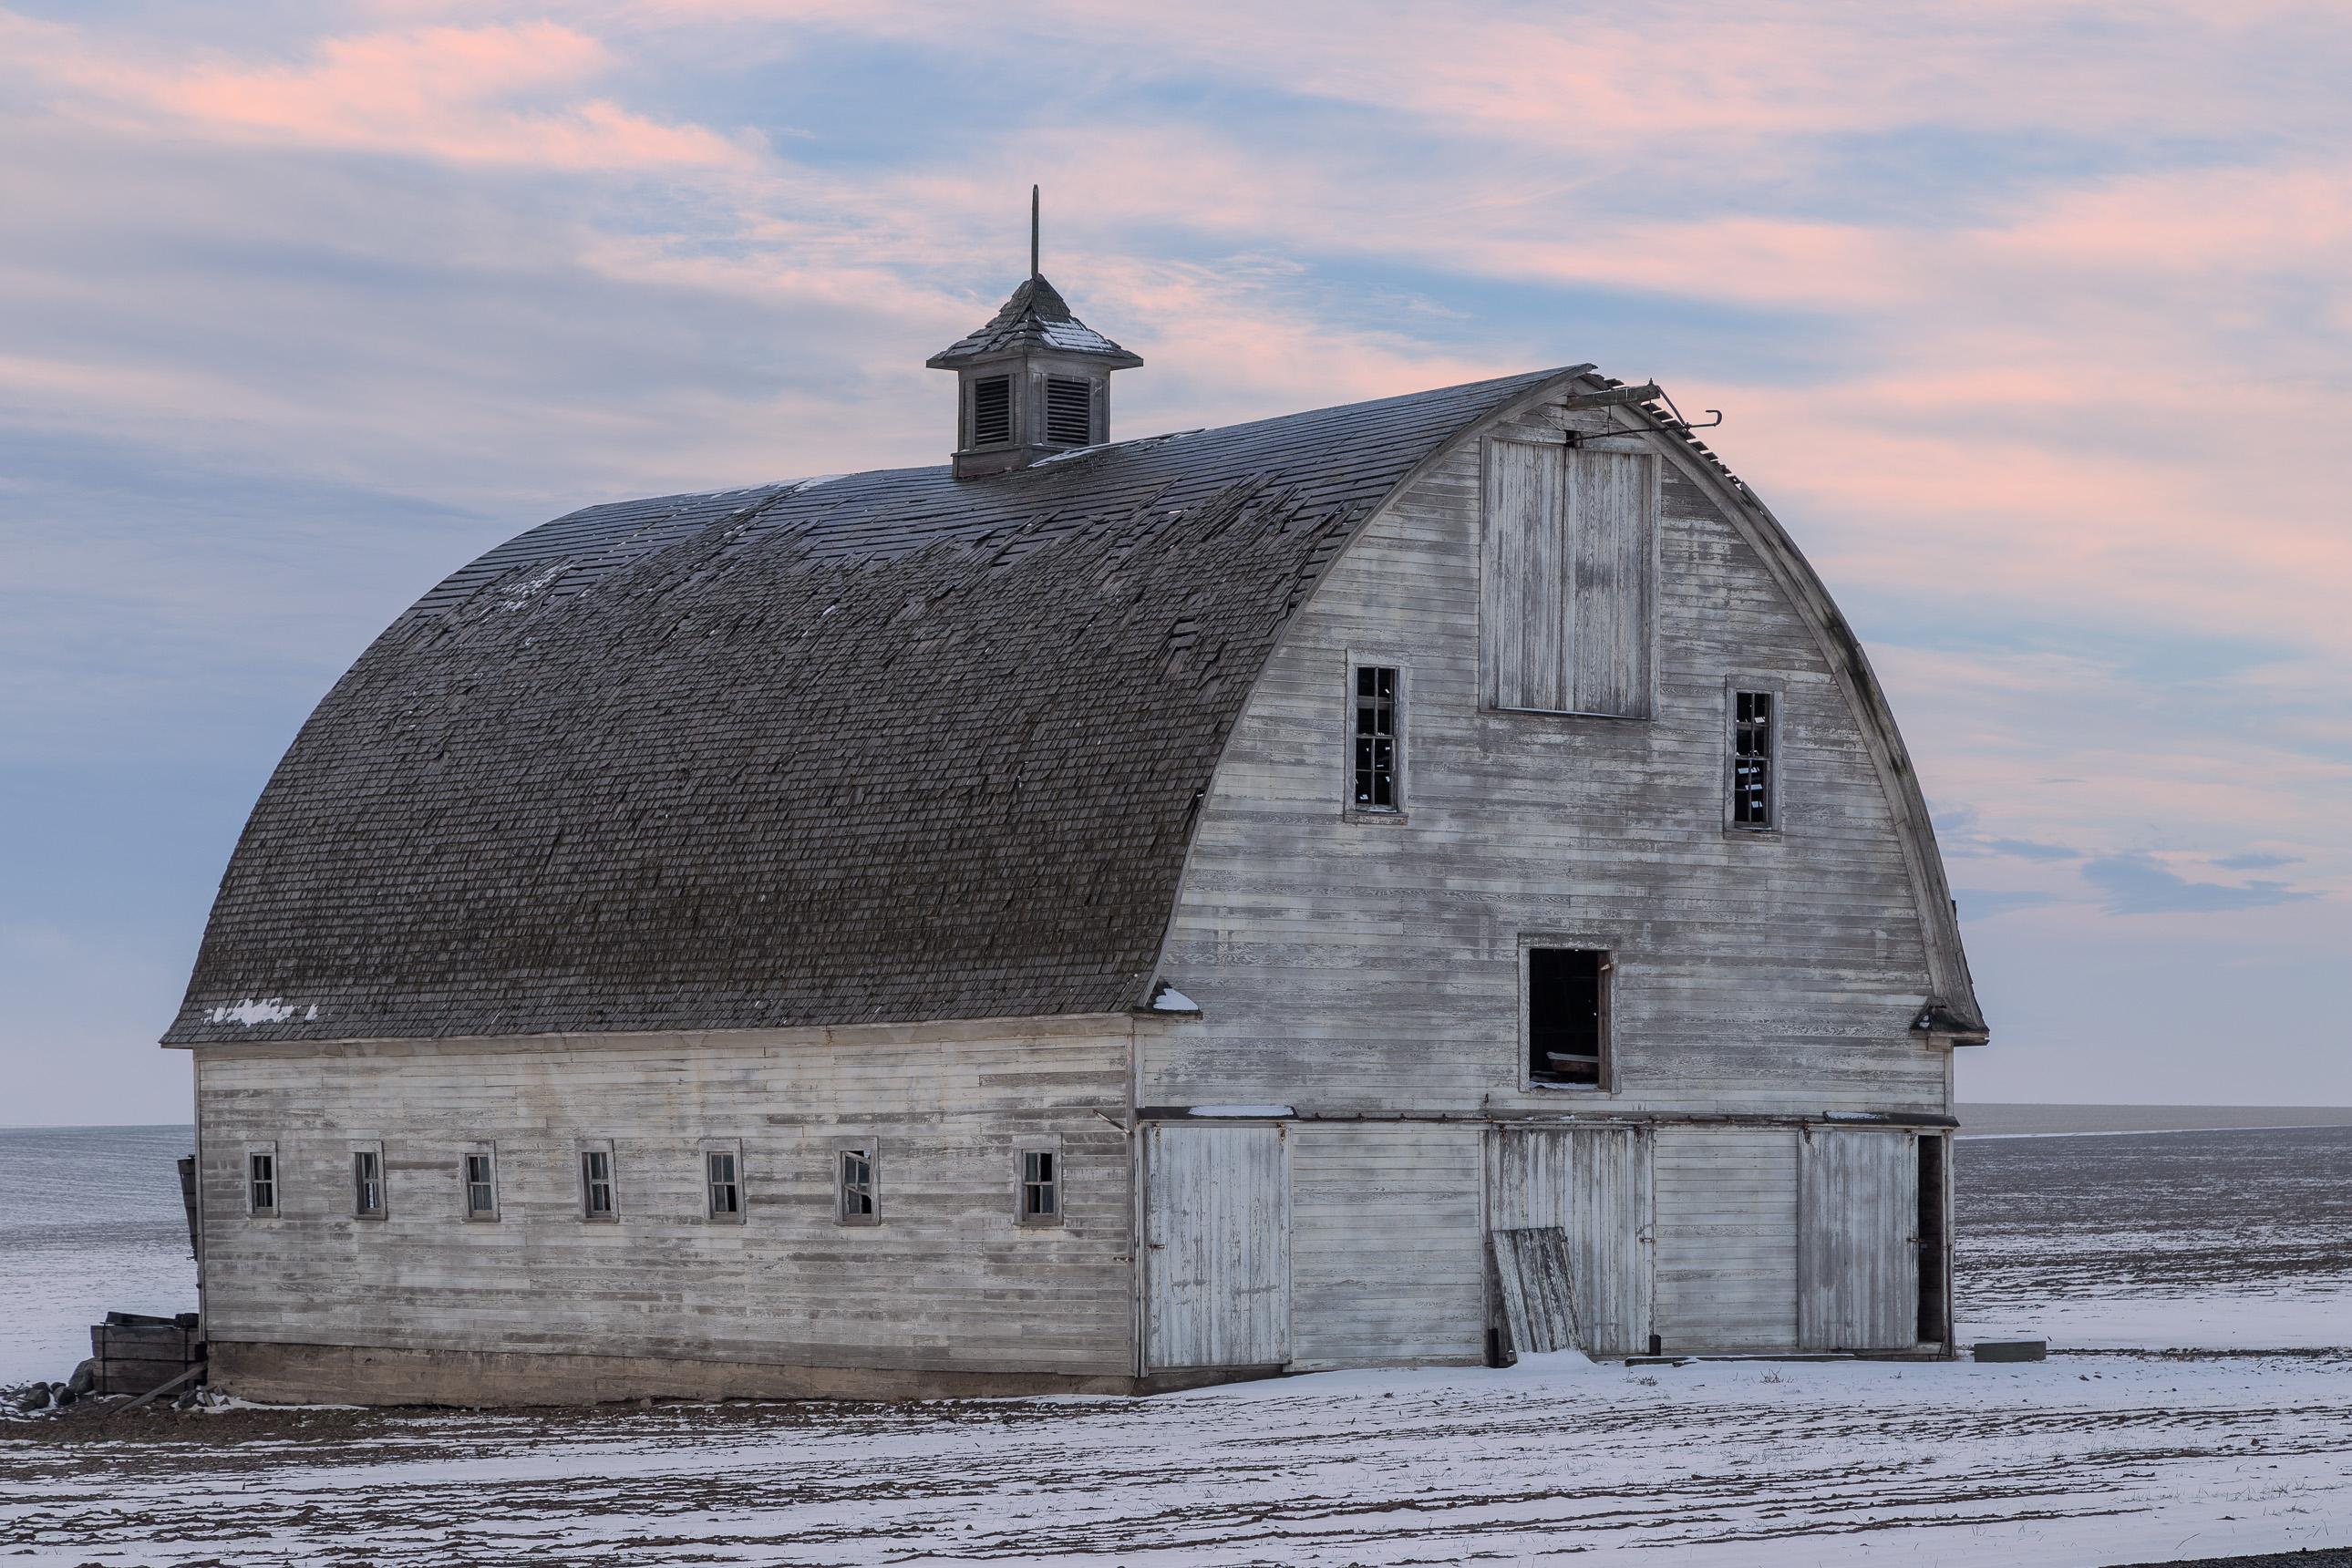 Abandoned white barn